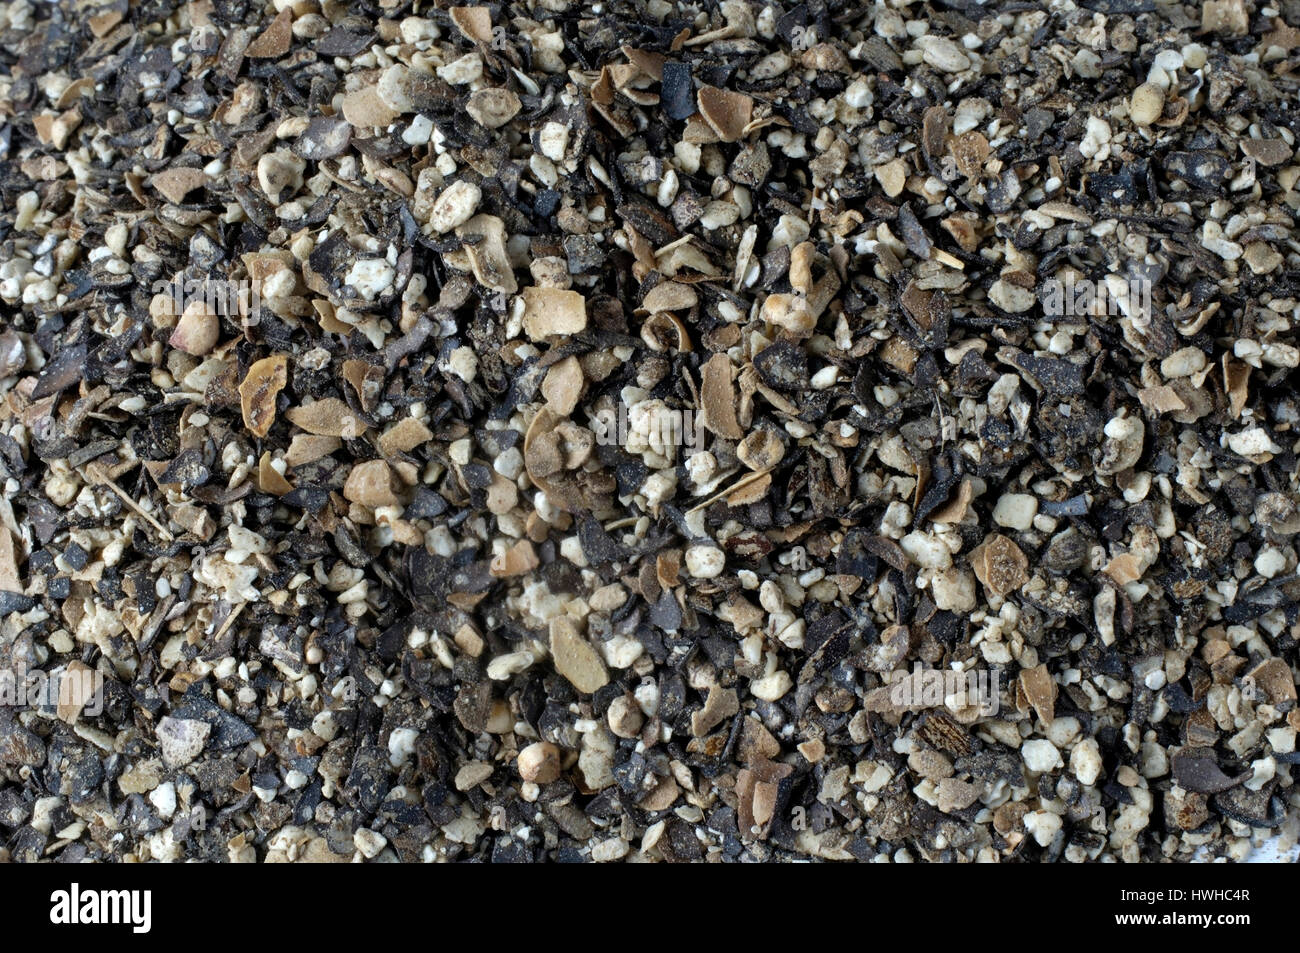 Rizinusschrot natural fertilizer, herbal fertilizer, organic fertilizers  , Rizinusschrot Naturduenger, Pflanzlicher - Stock Image